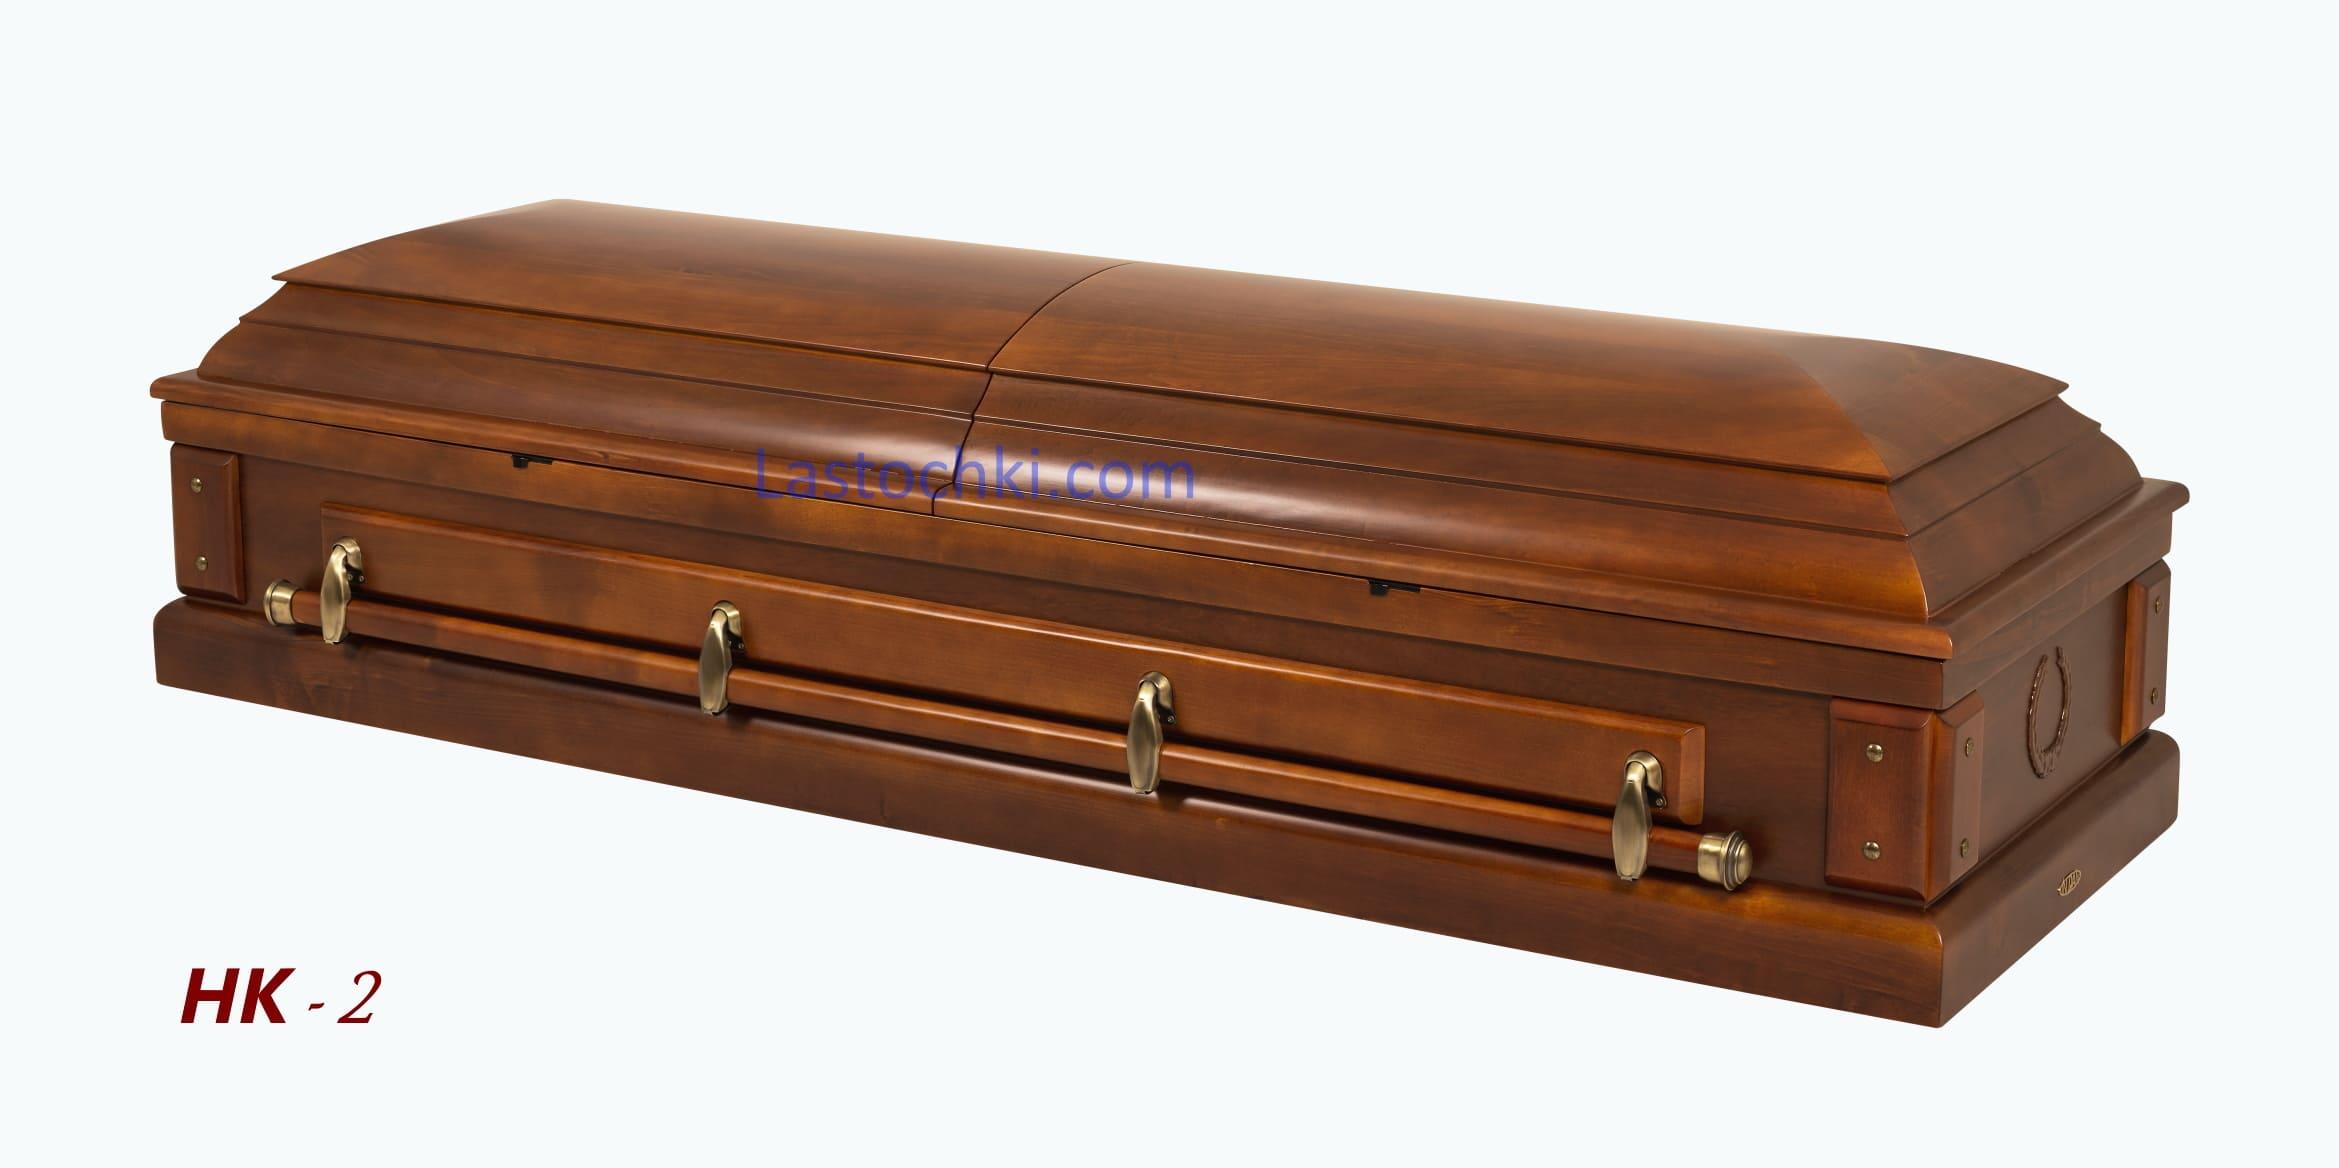 Саркофаг НК - 2 светлый орех - Цена 33 000 грн.